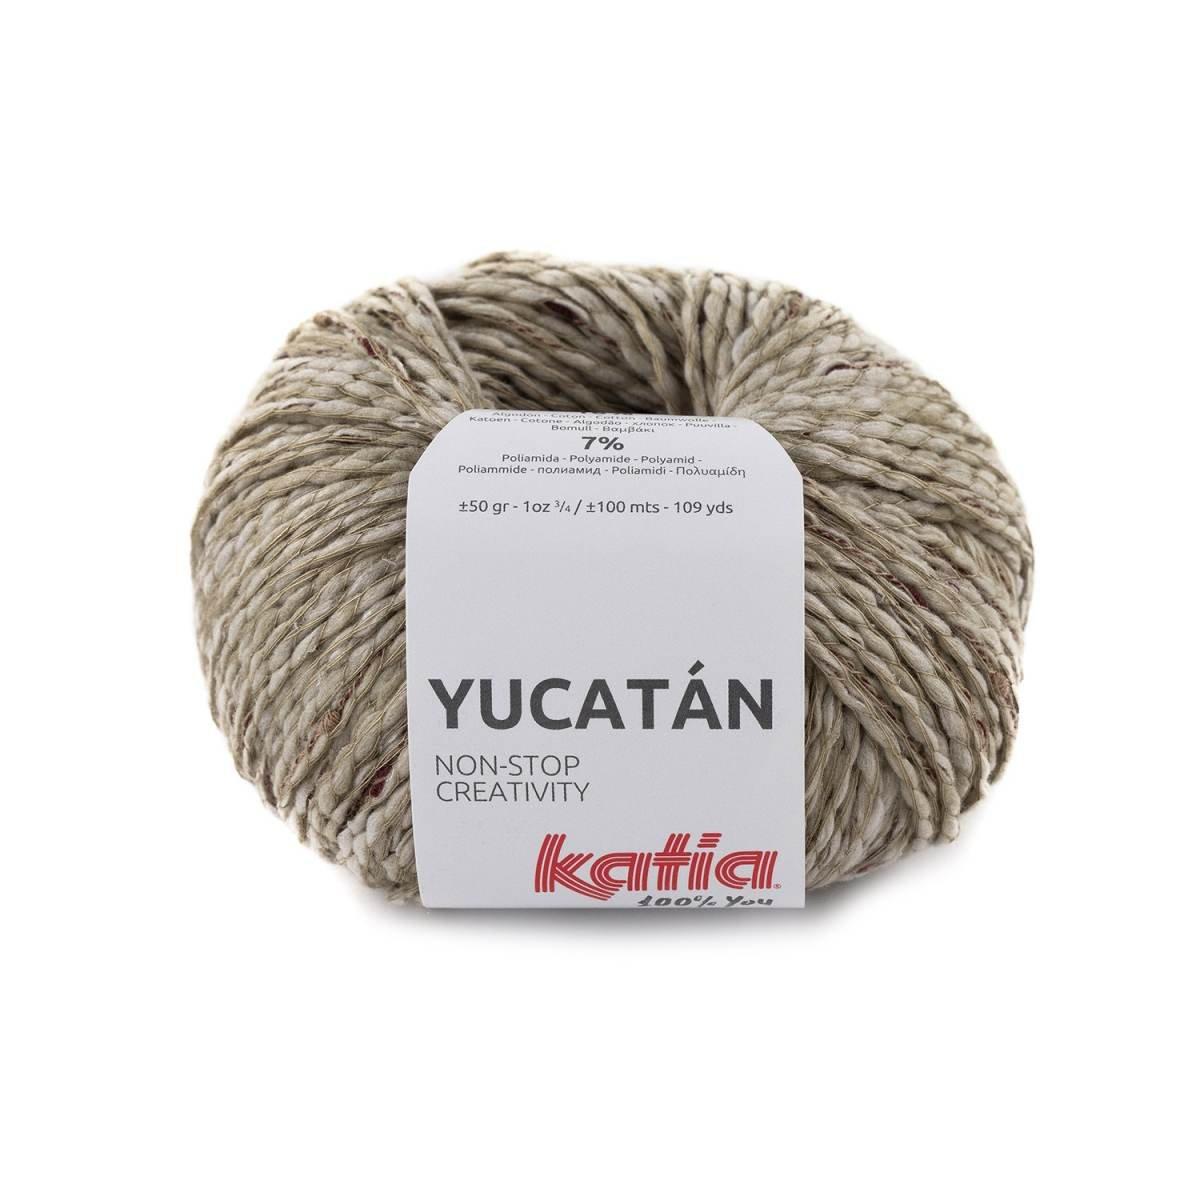 Yucatan - Concept by Katia